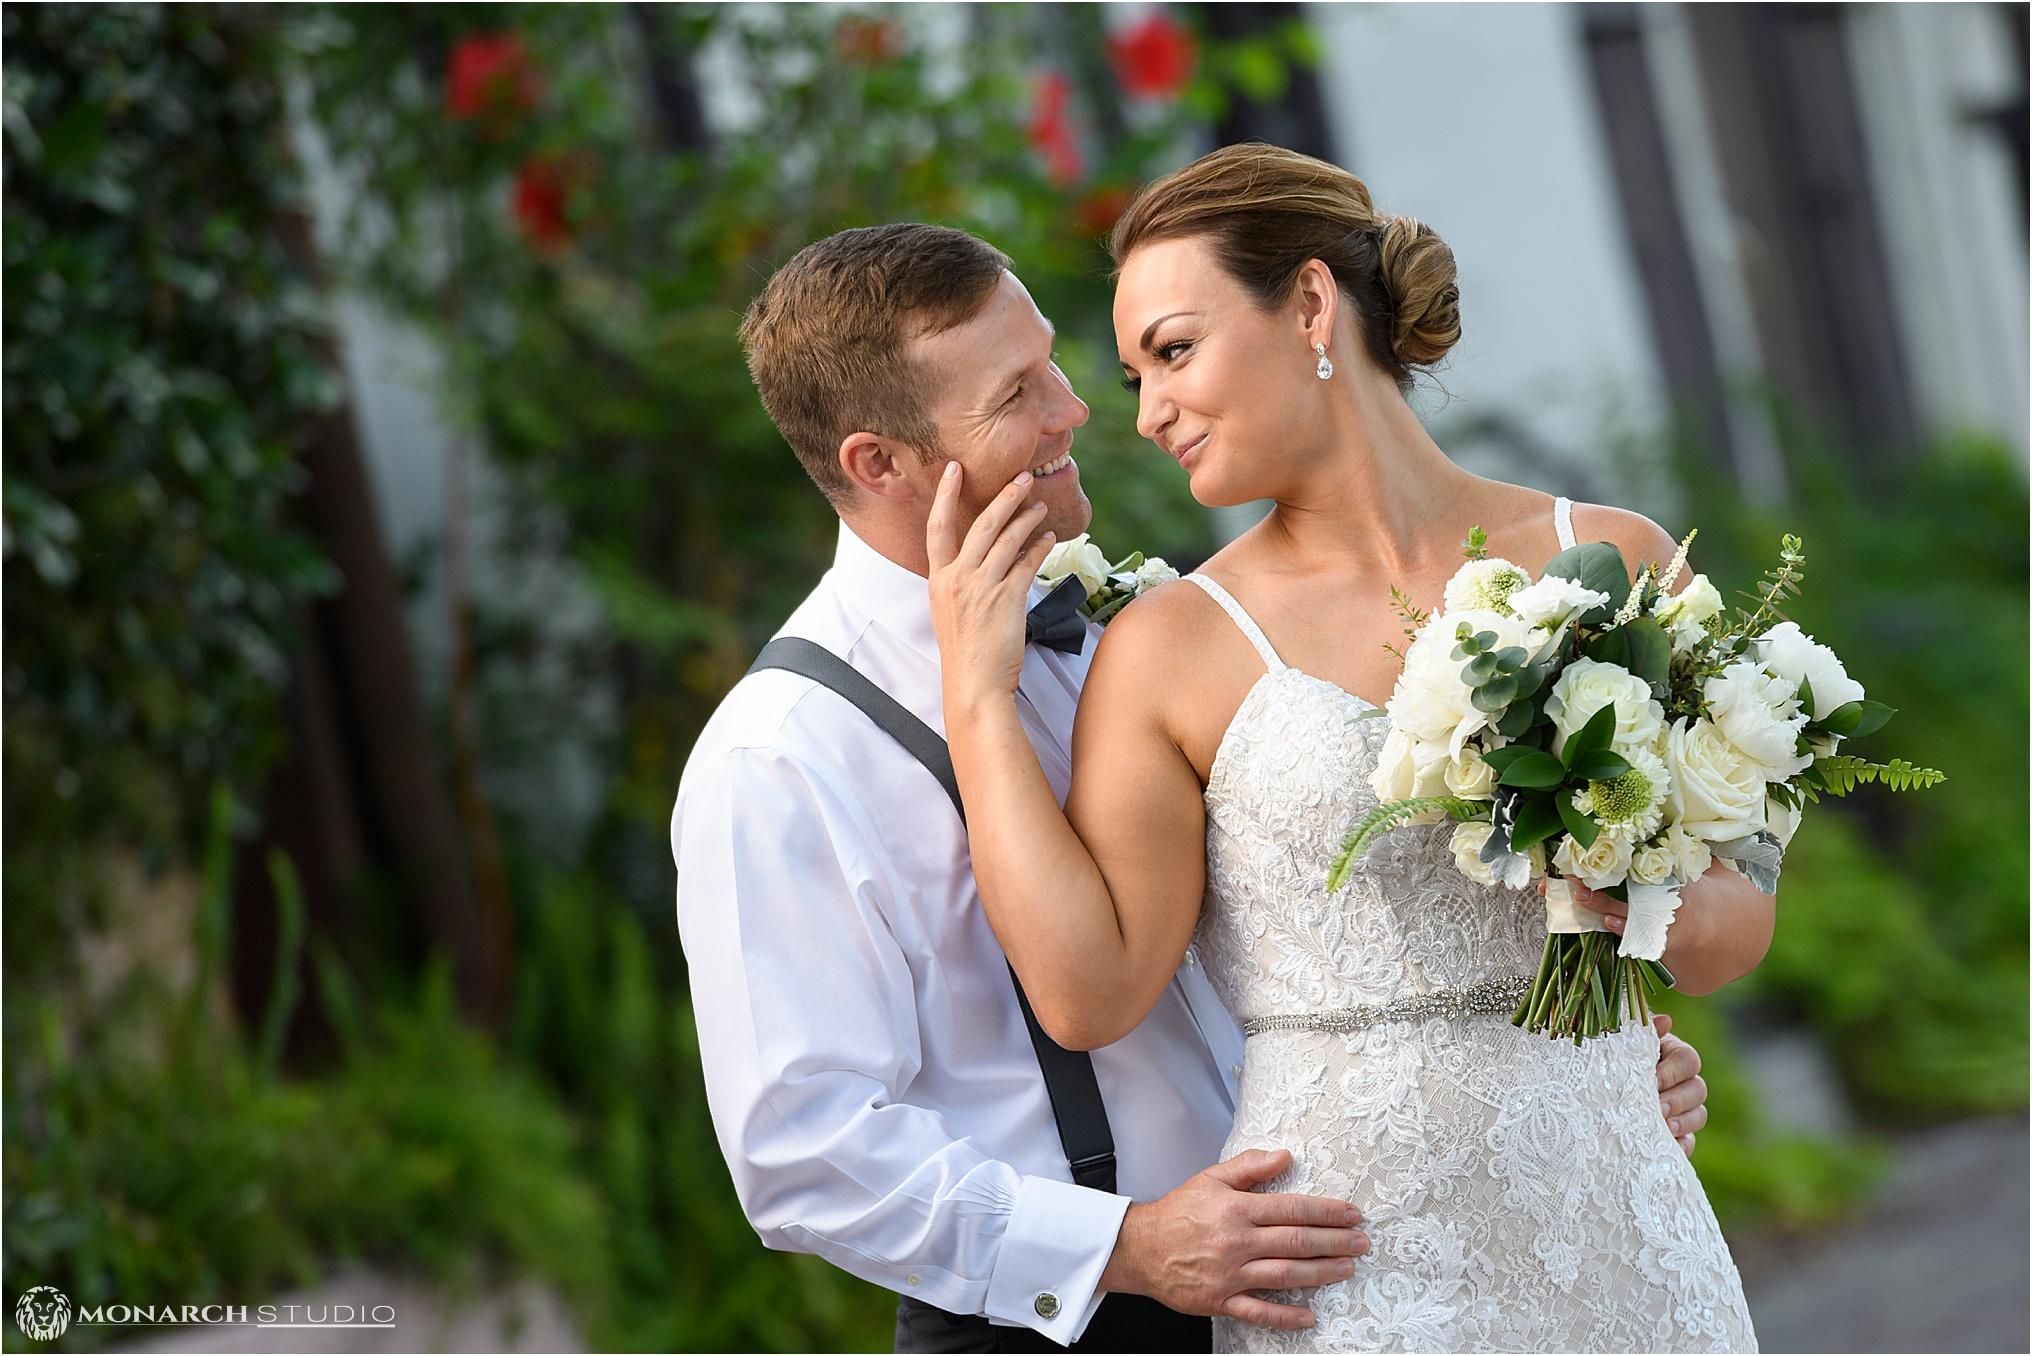 046-whiteroom-wedding-photographer-2019-05-22_0028.jpg